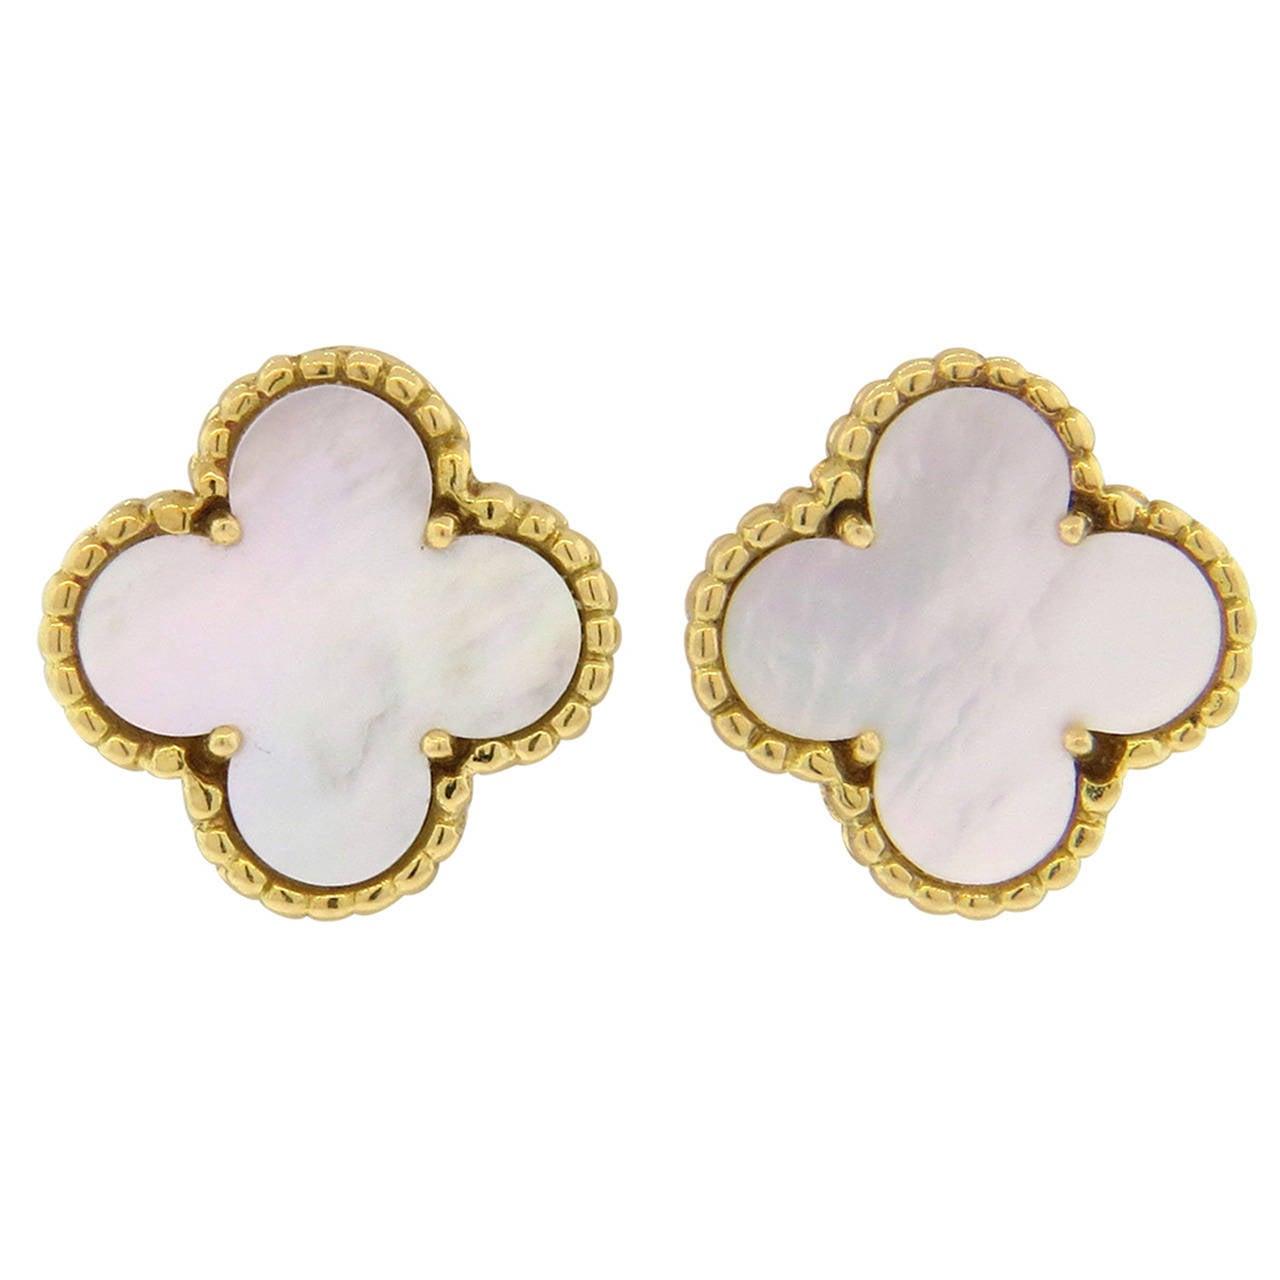 Van Cleef Arpels Vintage Alhambra Mother Of Pearl Gold Clover Earrings For